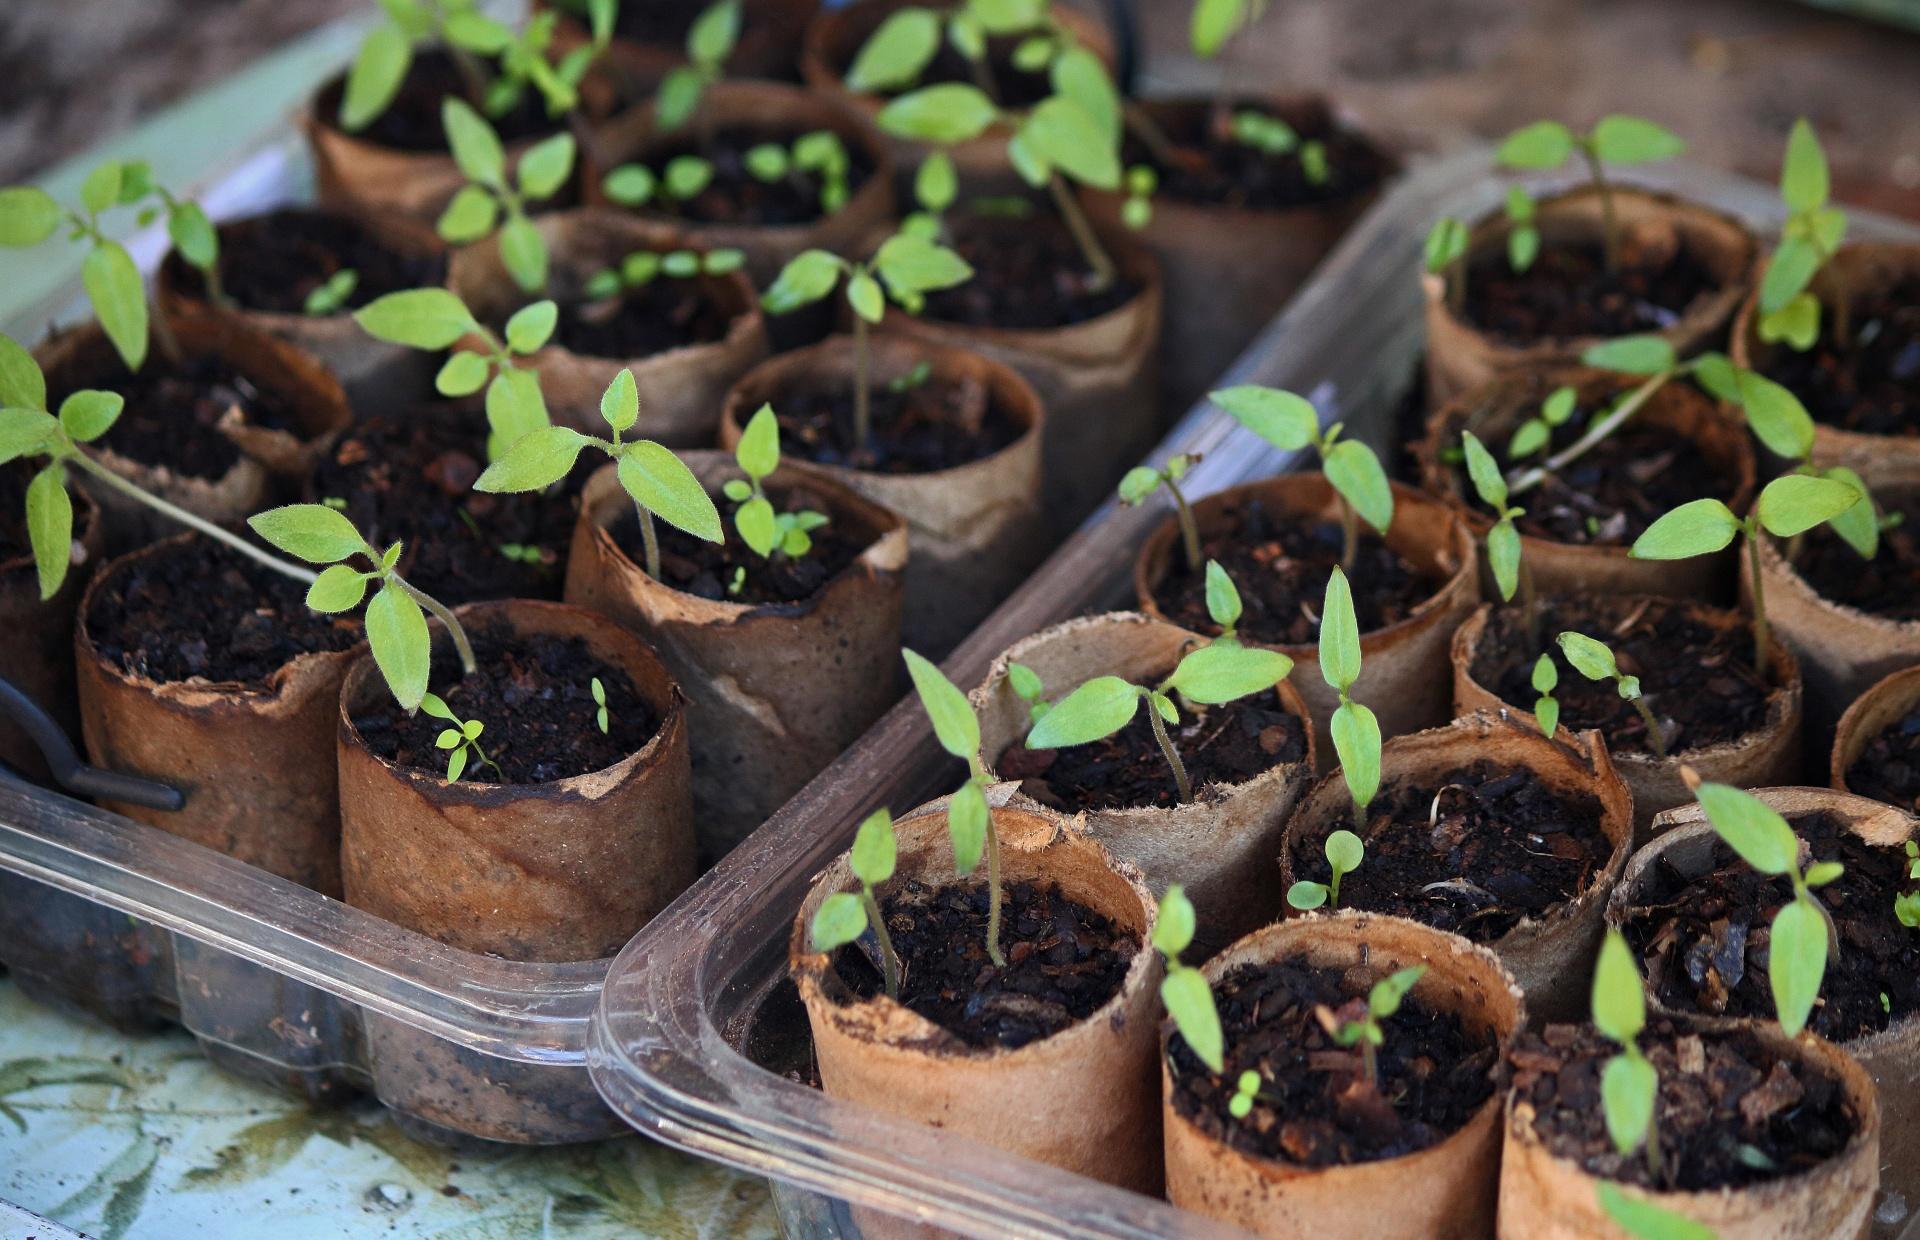 Tree Tomato Saplings In A Tray